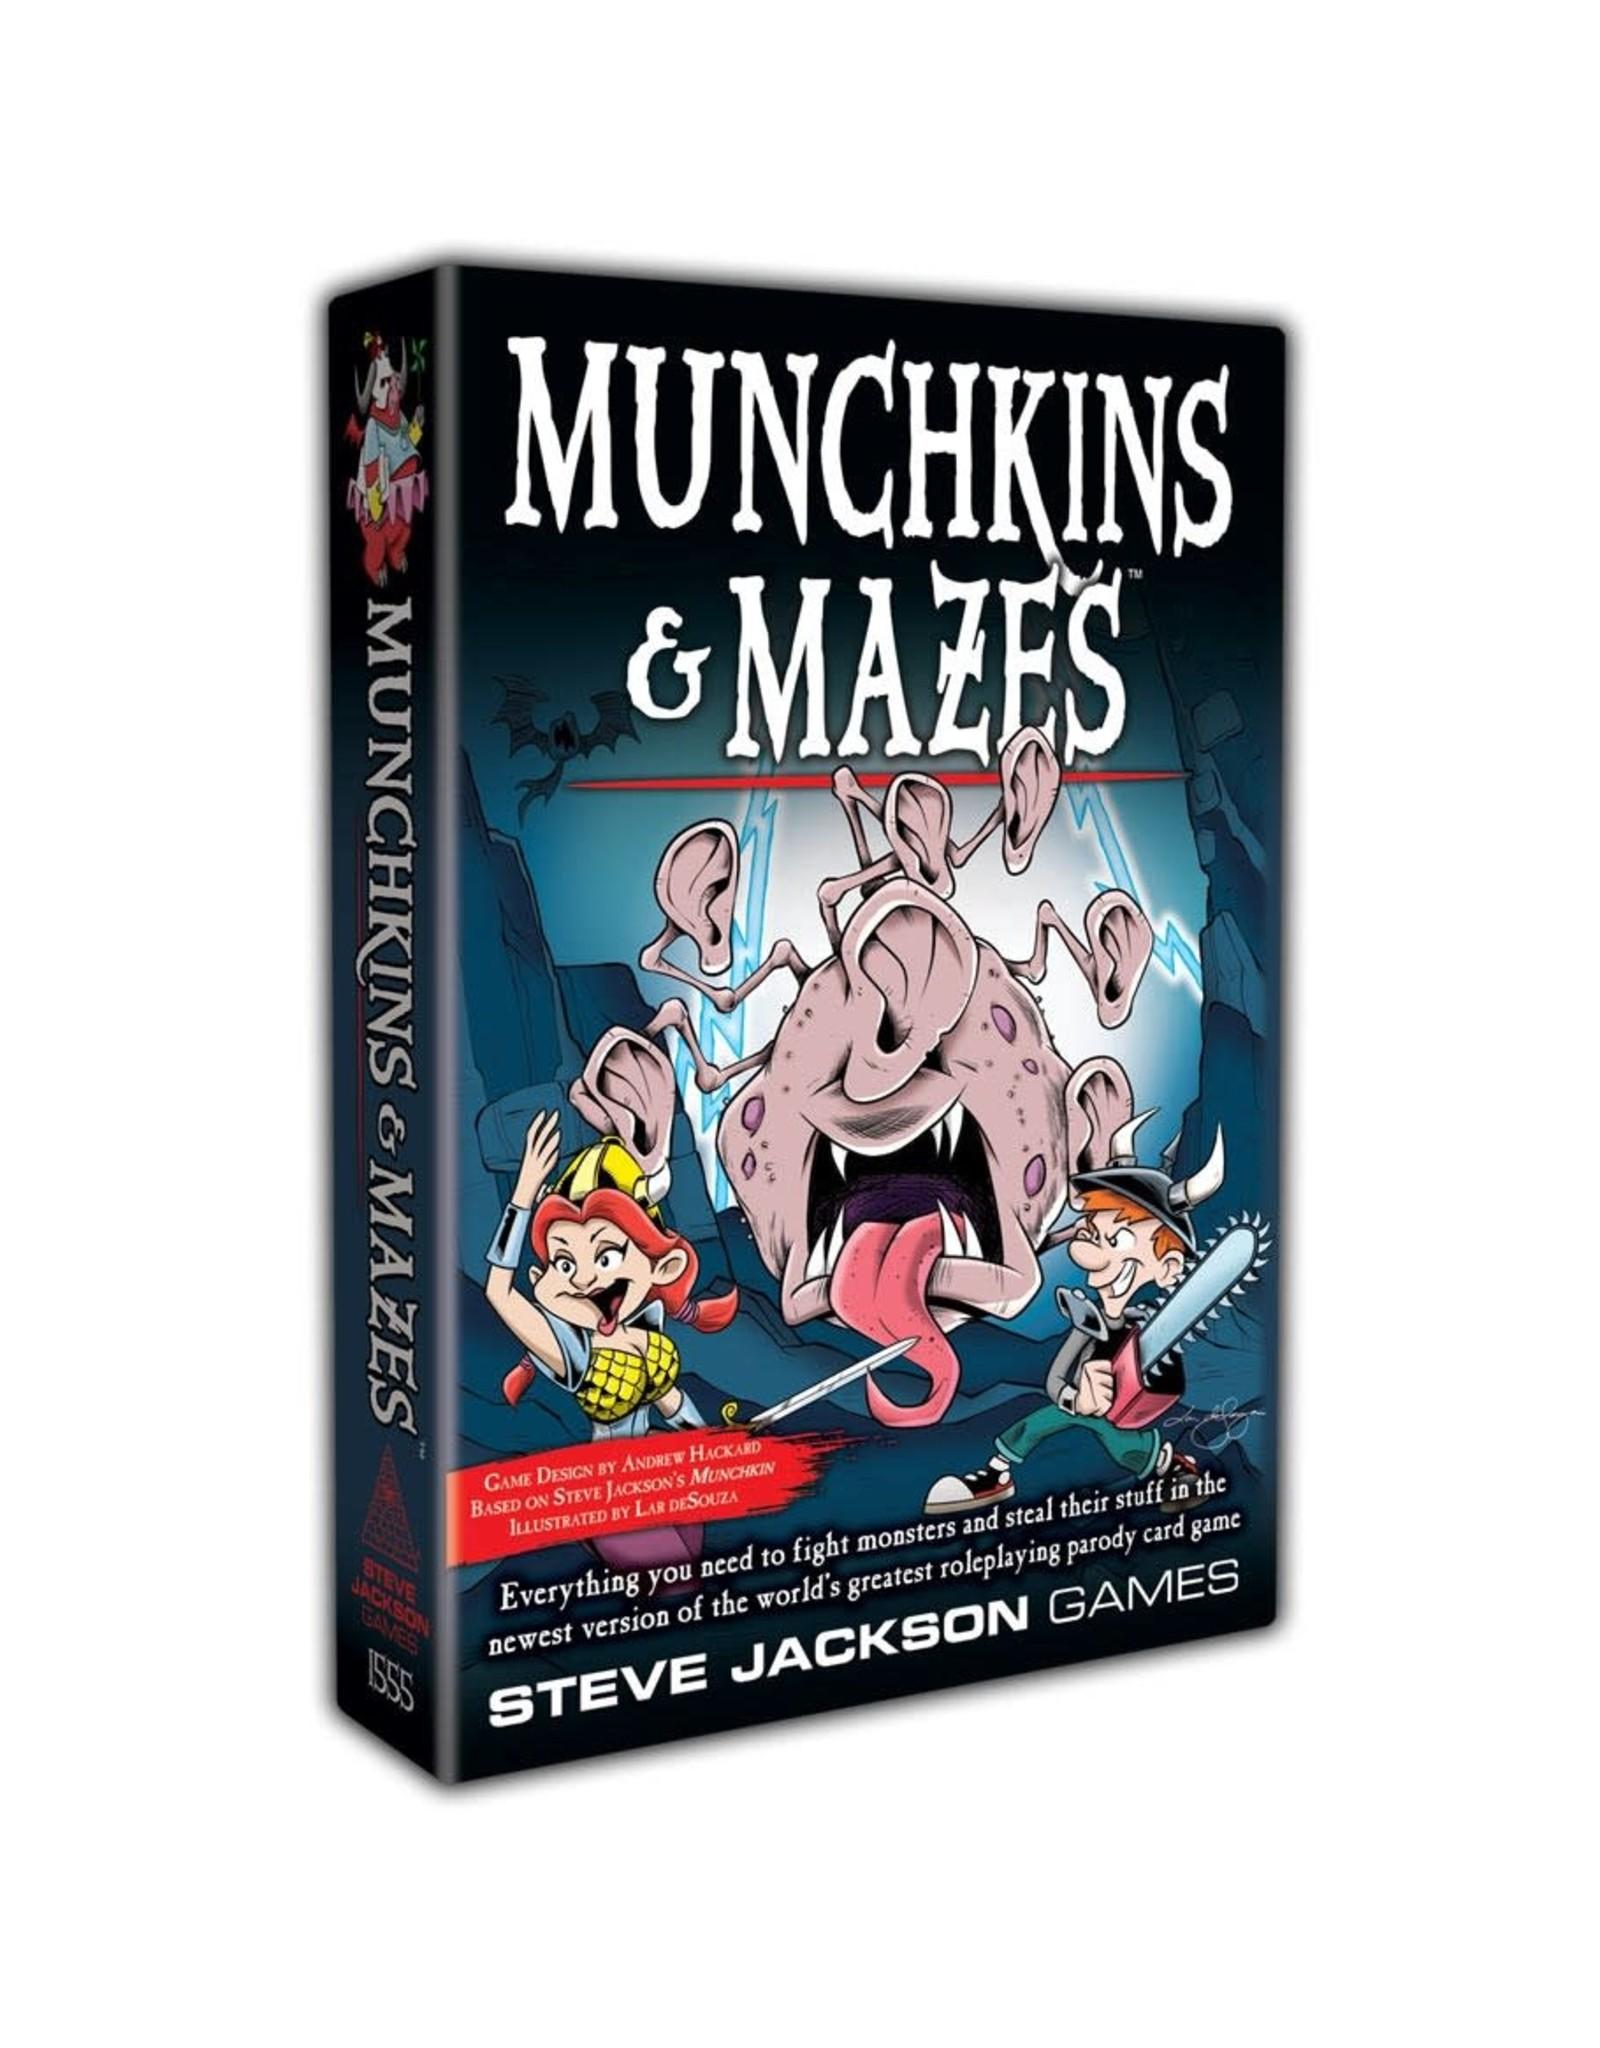 Steve Jackson Games Munchkin: Munchkins & Mazes